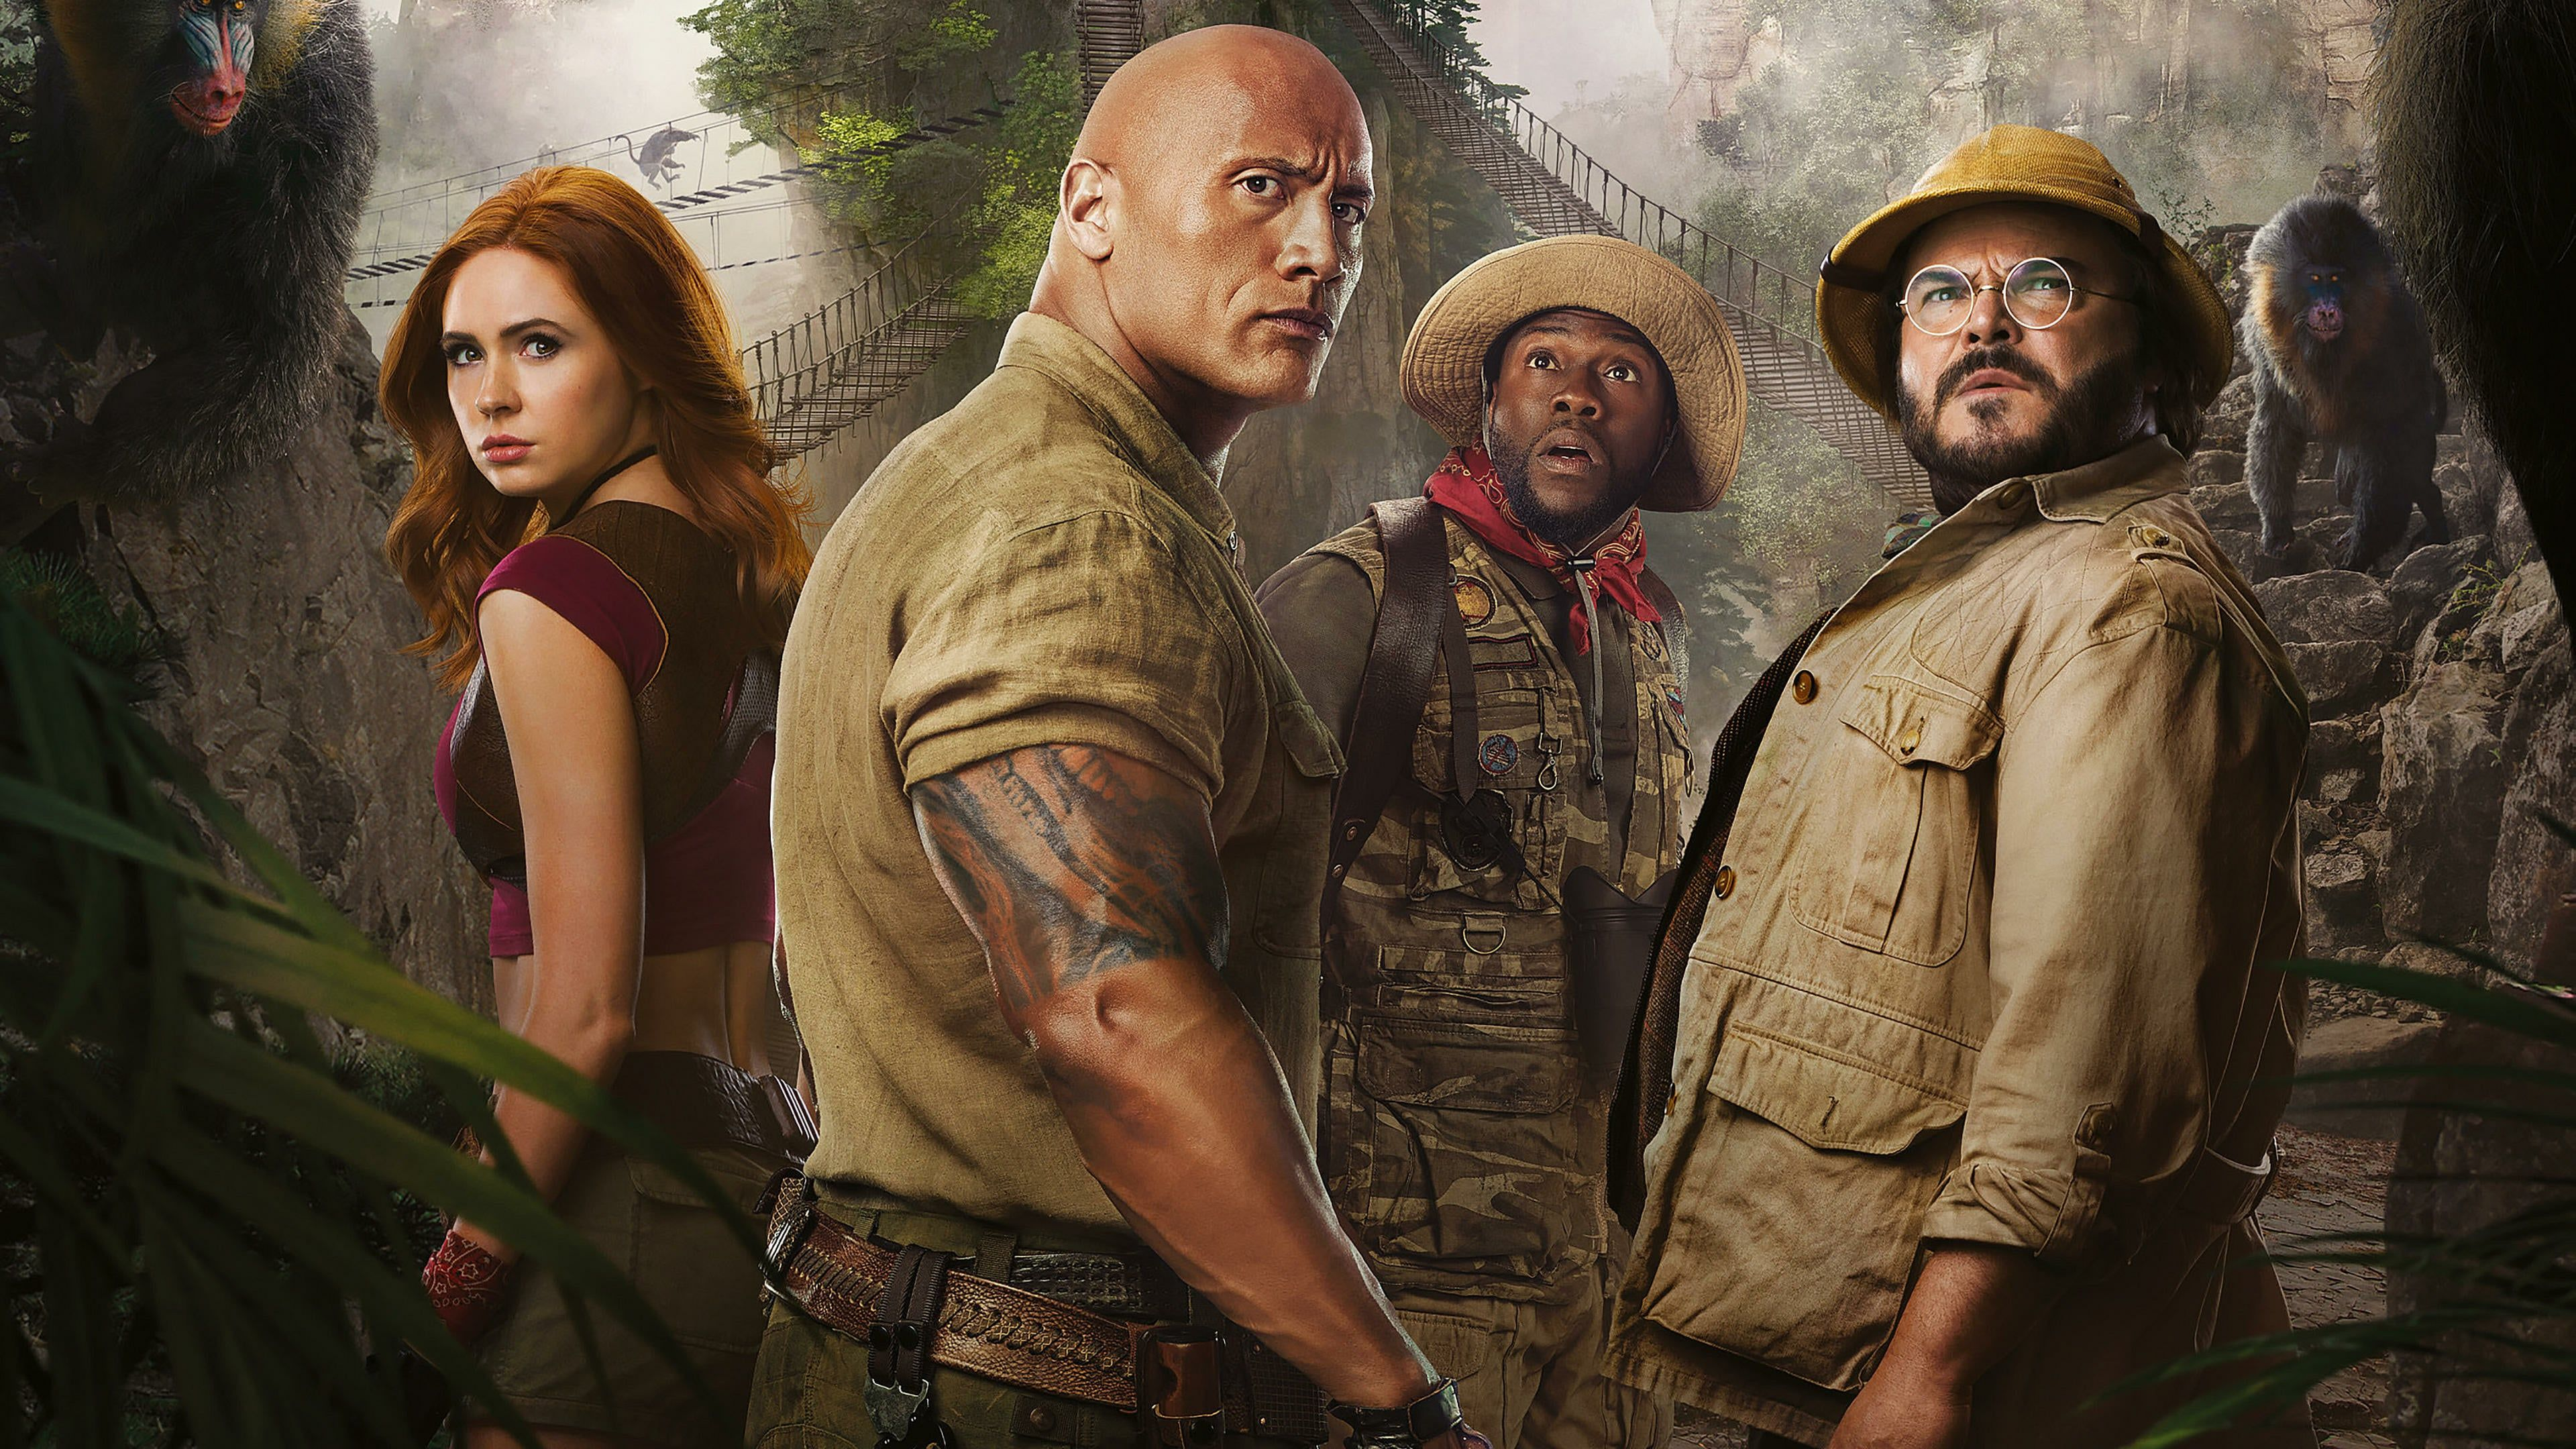 Jumanji El Siguiente Nivel 2019 Pelicula Completa Online En Espanol This Is Us Movie Welcome To The Jungle Free Movies Online